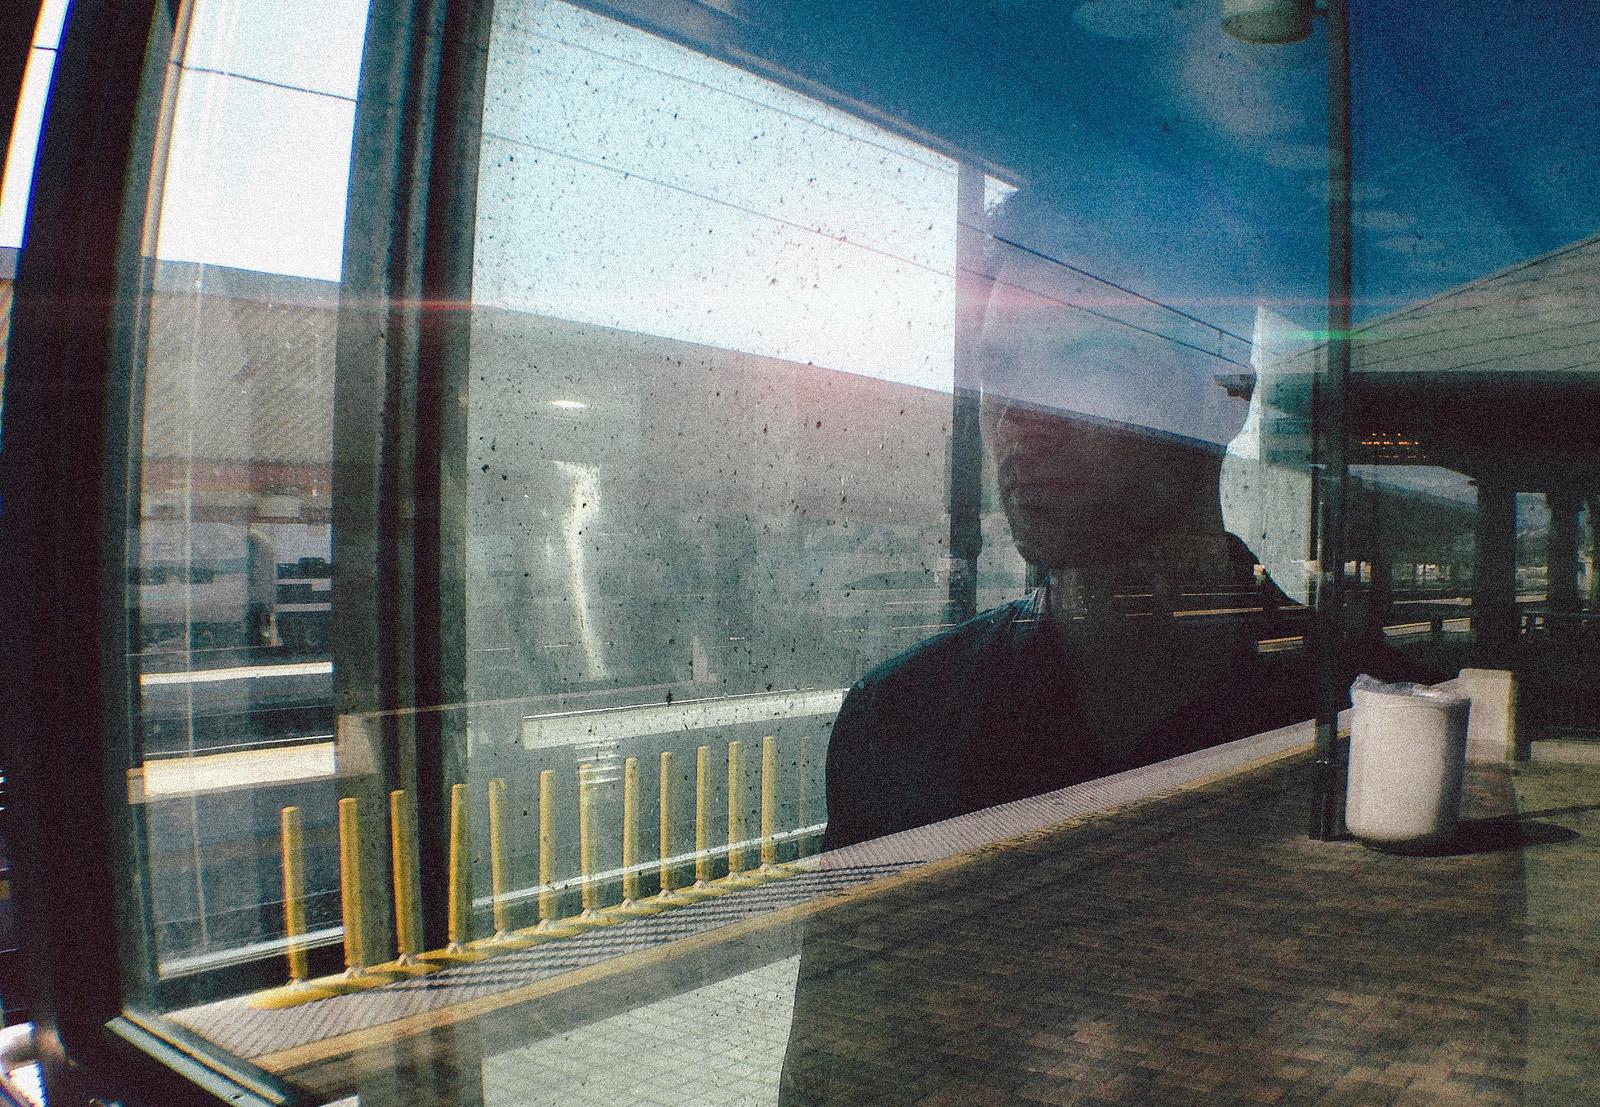 sci-fi-superhero-short-film-shot-on-iphone-genesis-10.jpg